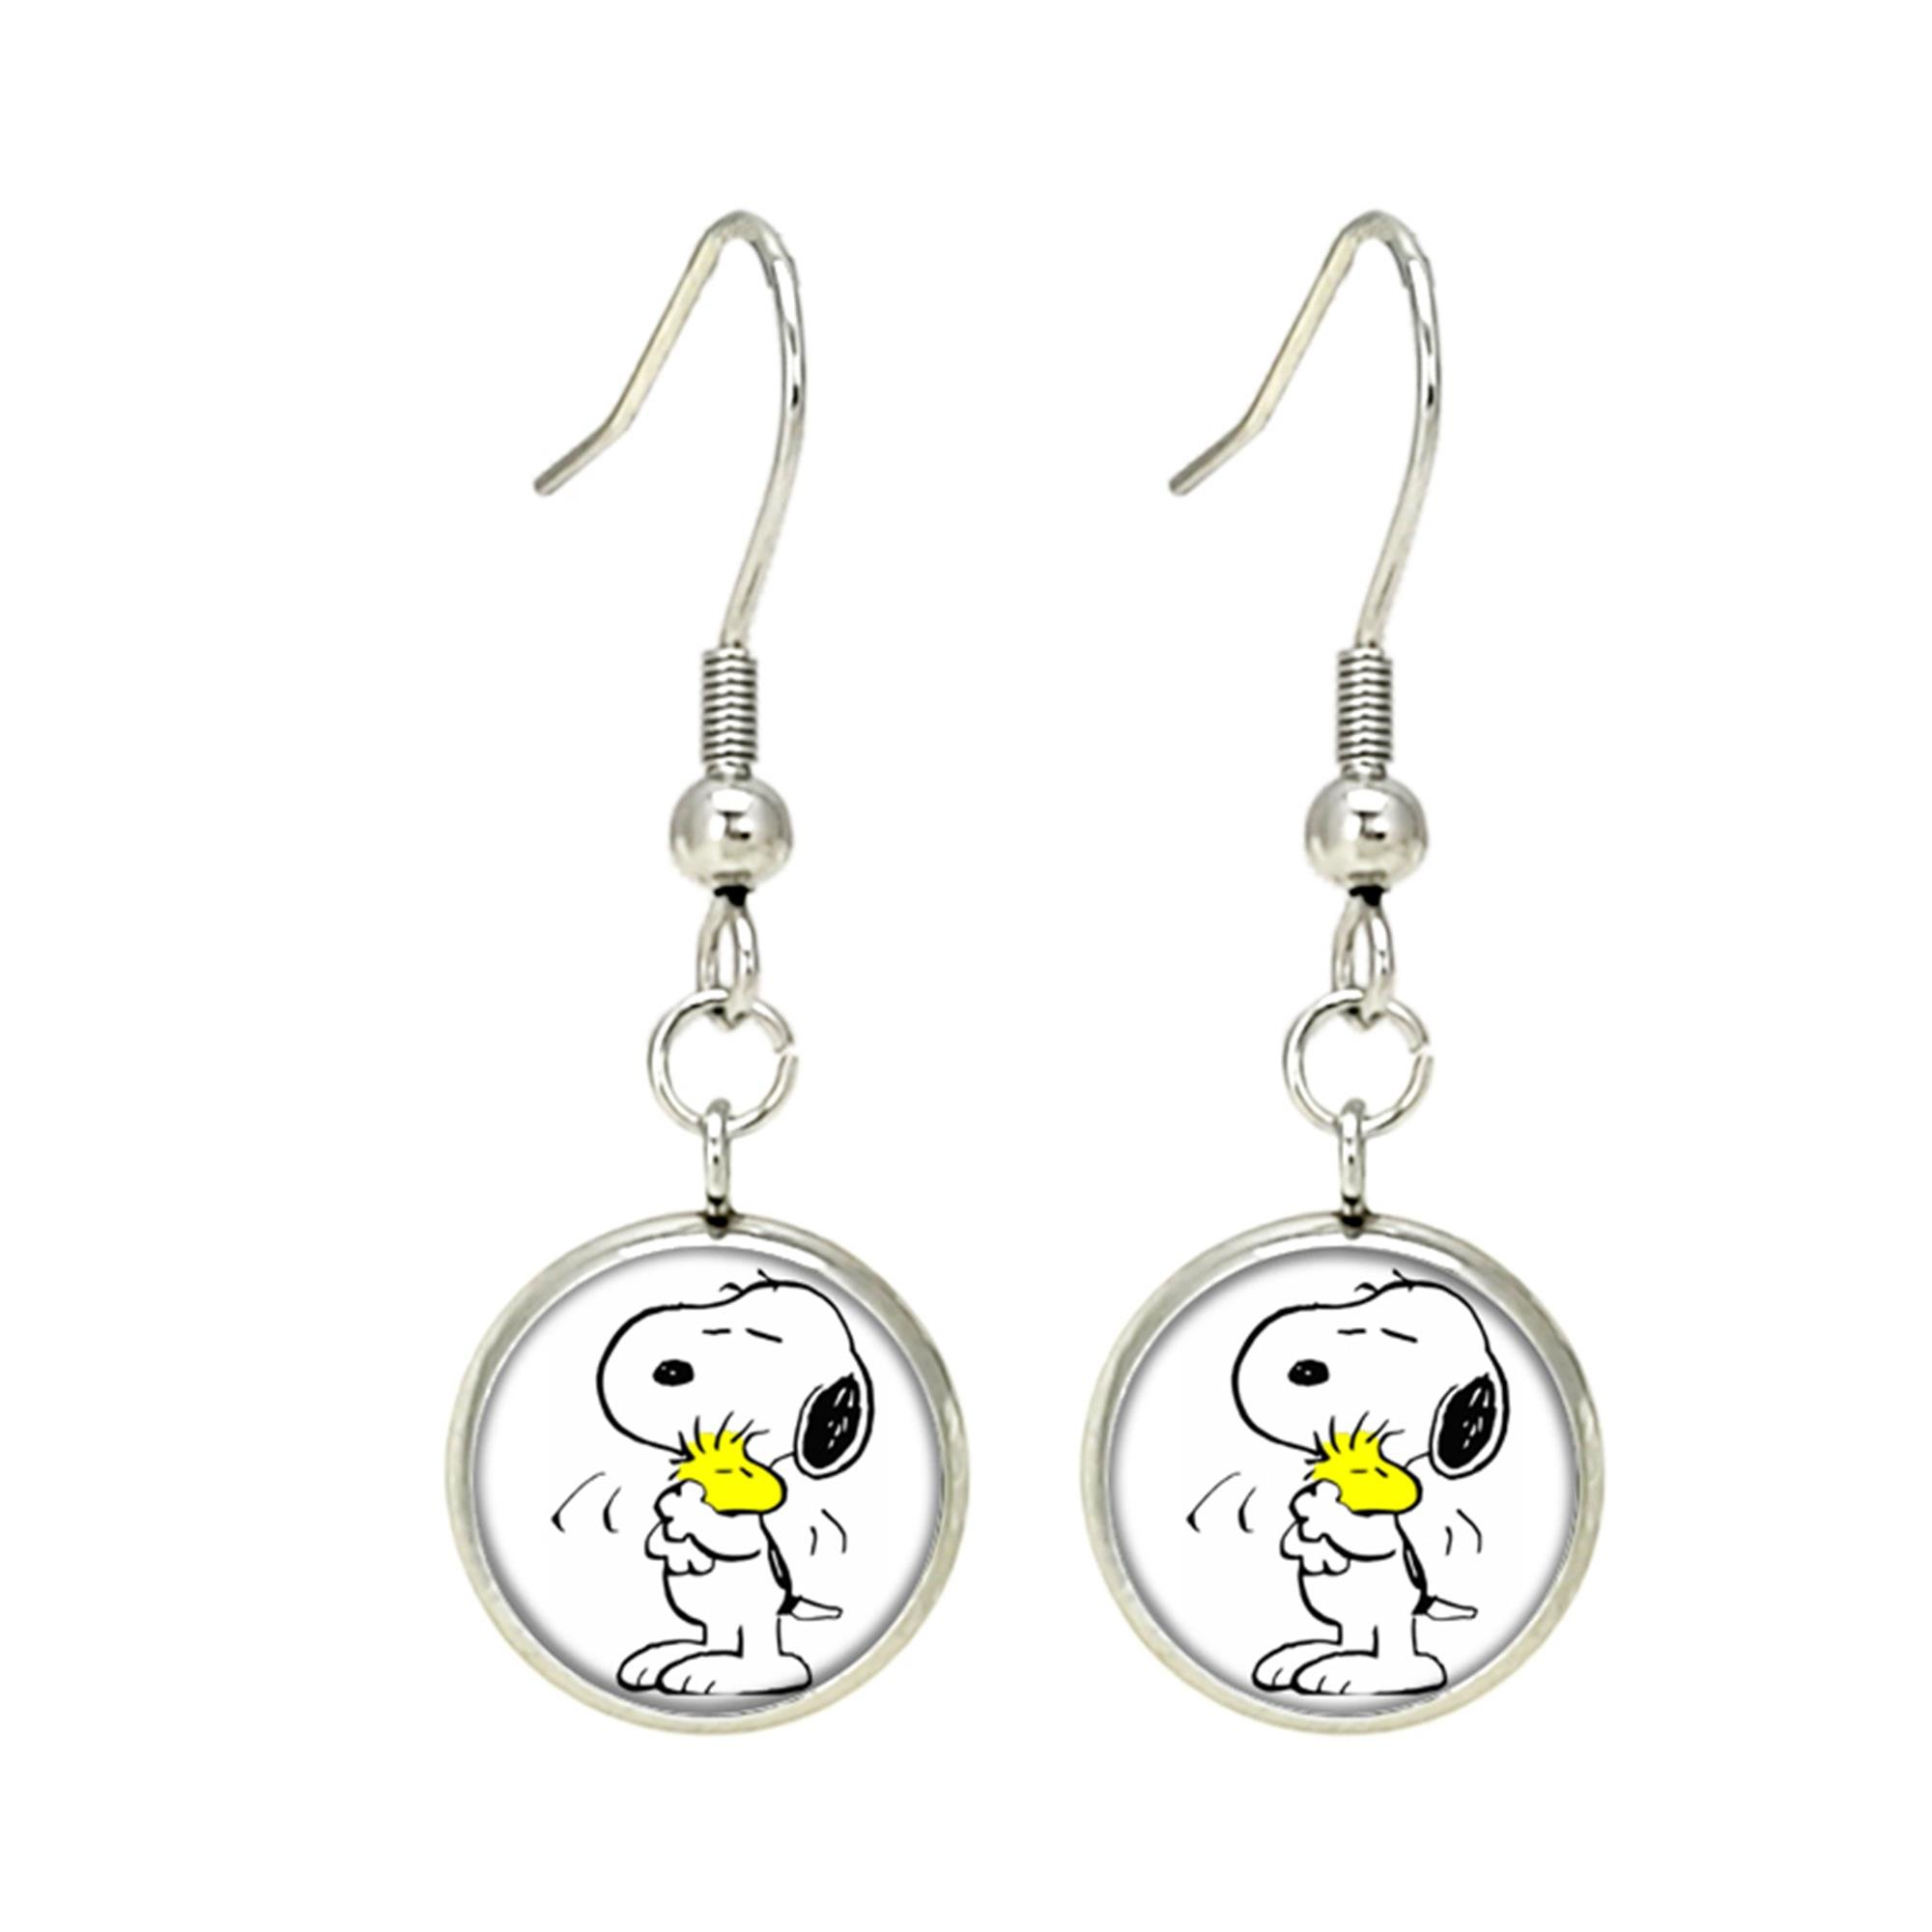 Charlie Brown Snoopy Dangle Earrings TV Movies Classic Cartoons Superhero Logo Theme Peanuts Sally Lucy Linus Woodstock Premium Quality Detailed Cosplay Jewelry Gift Series